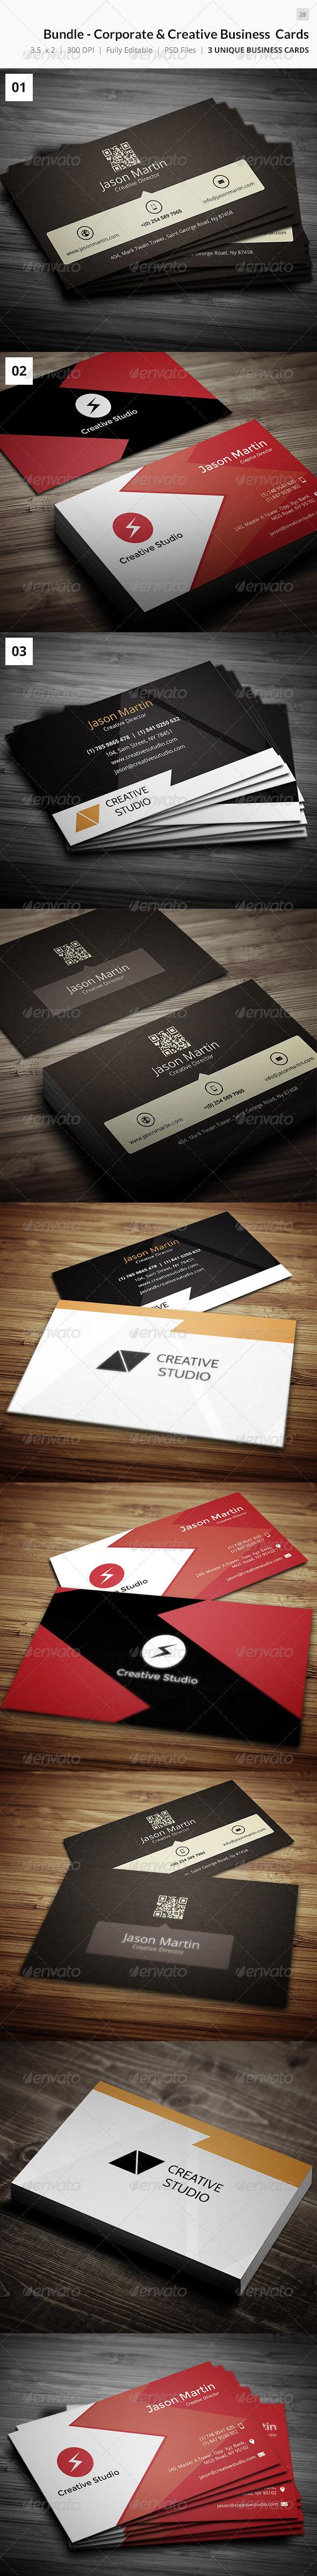 GraphicRiver Bundle Creative & Corporate Business Cards 28 7634815